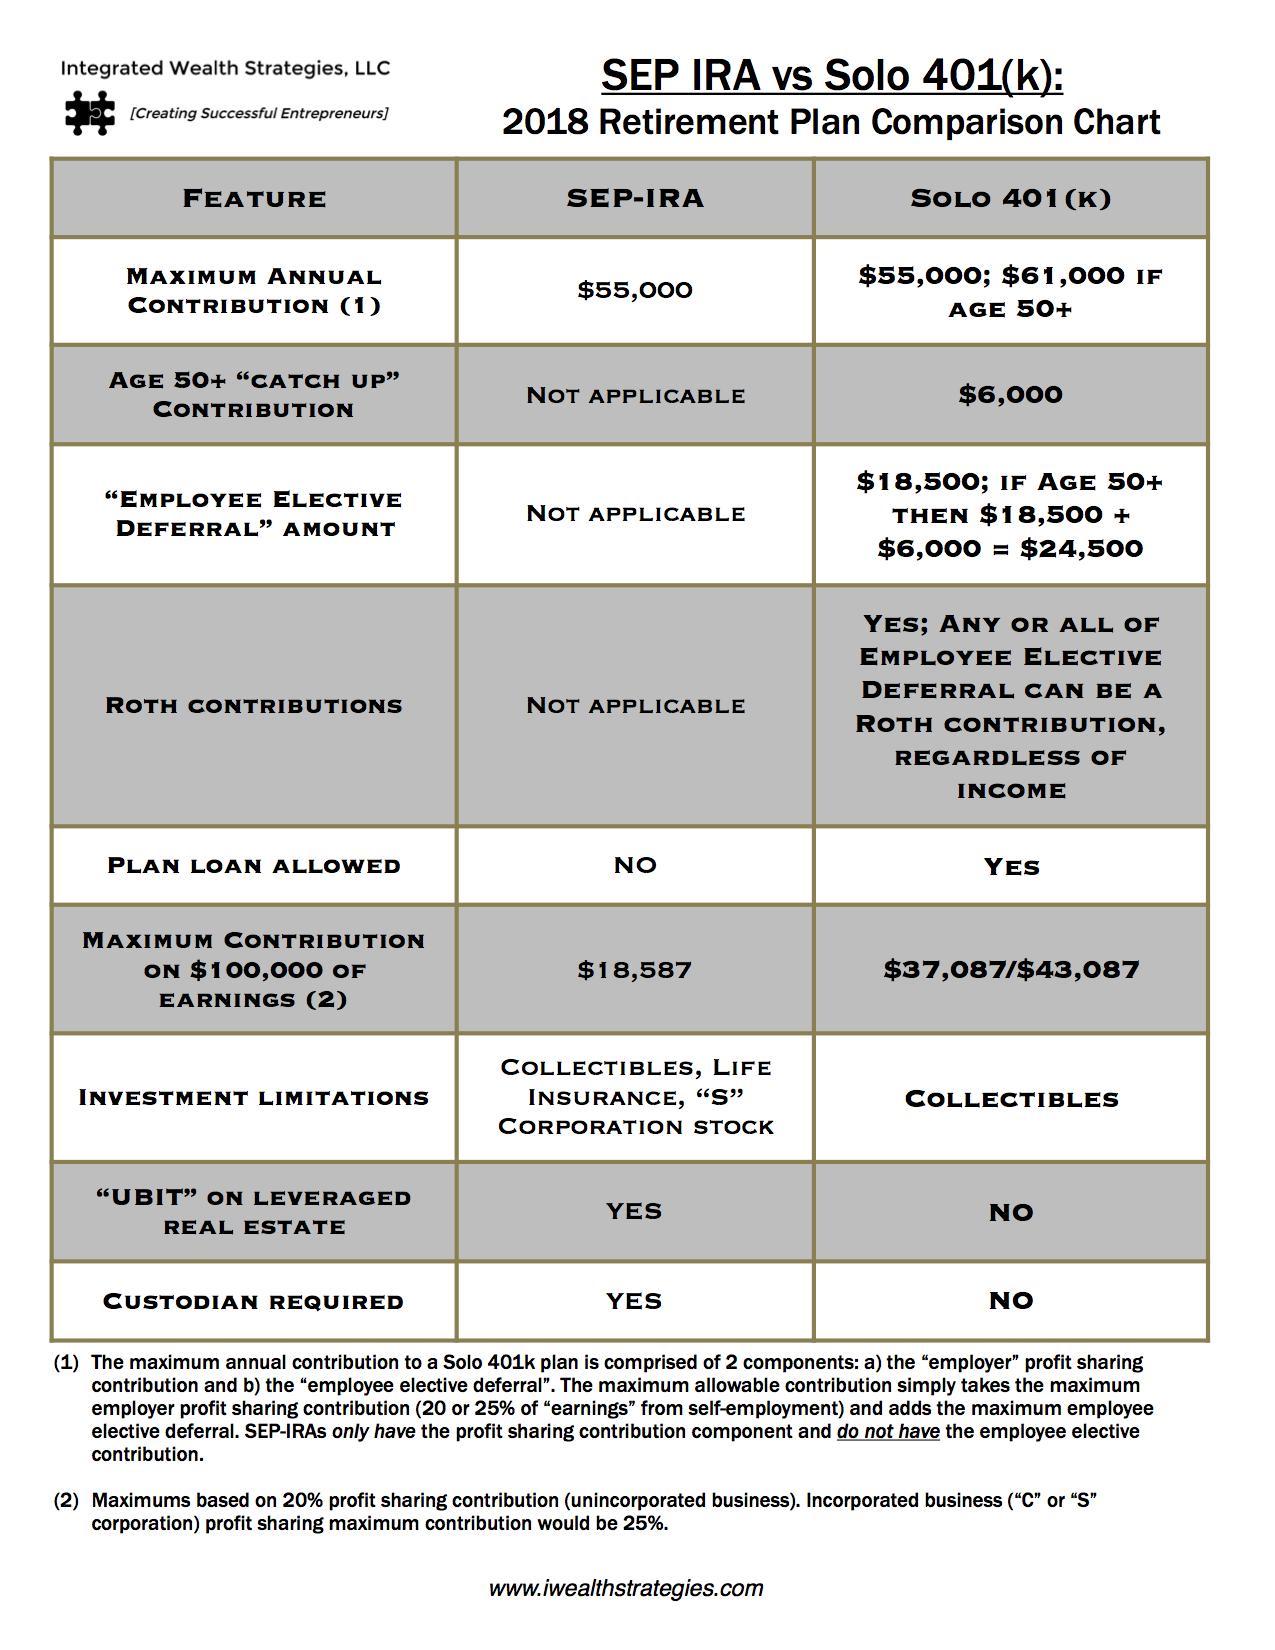 IWS - 2018  SEP vs Solo 401k Retirement plan comparison chart Squarespace v1.png